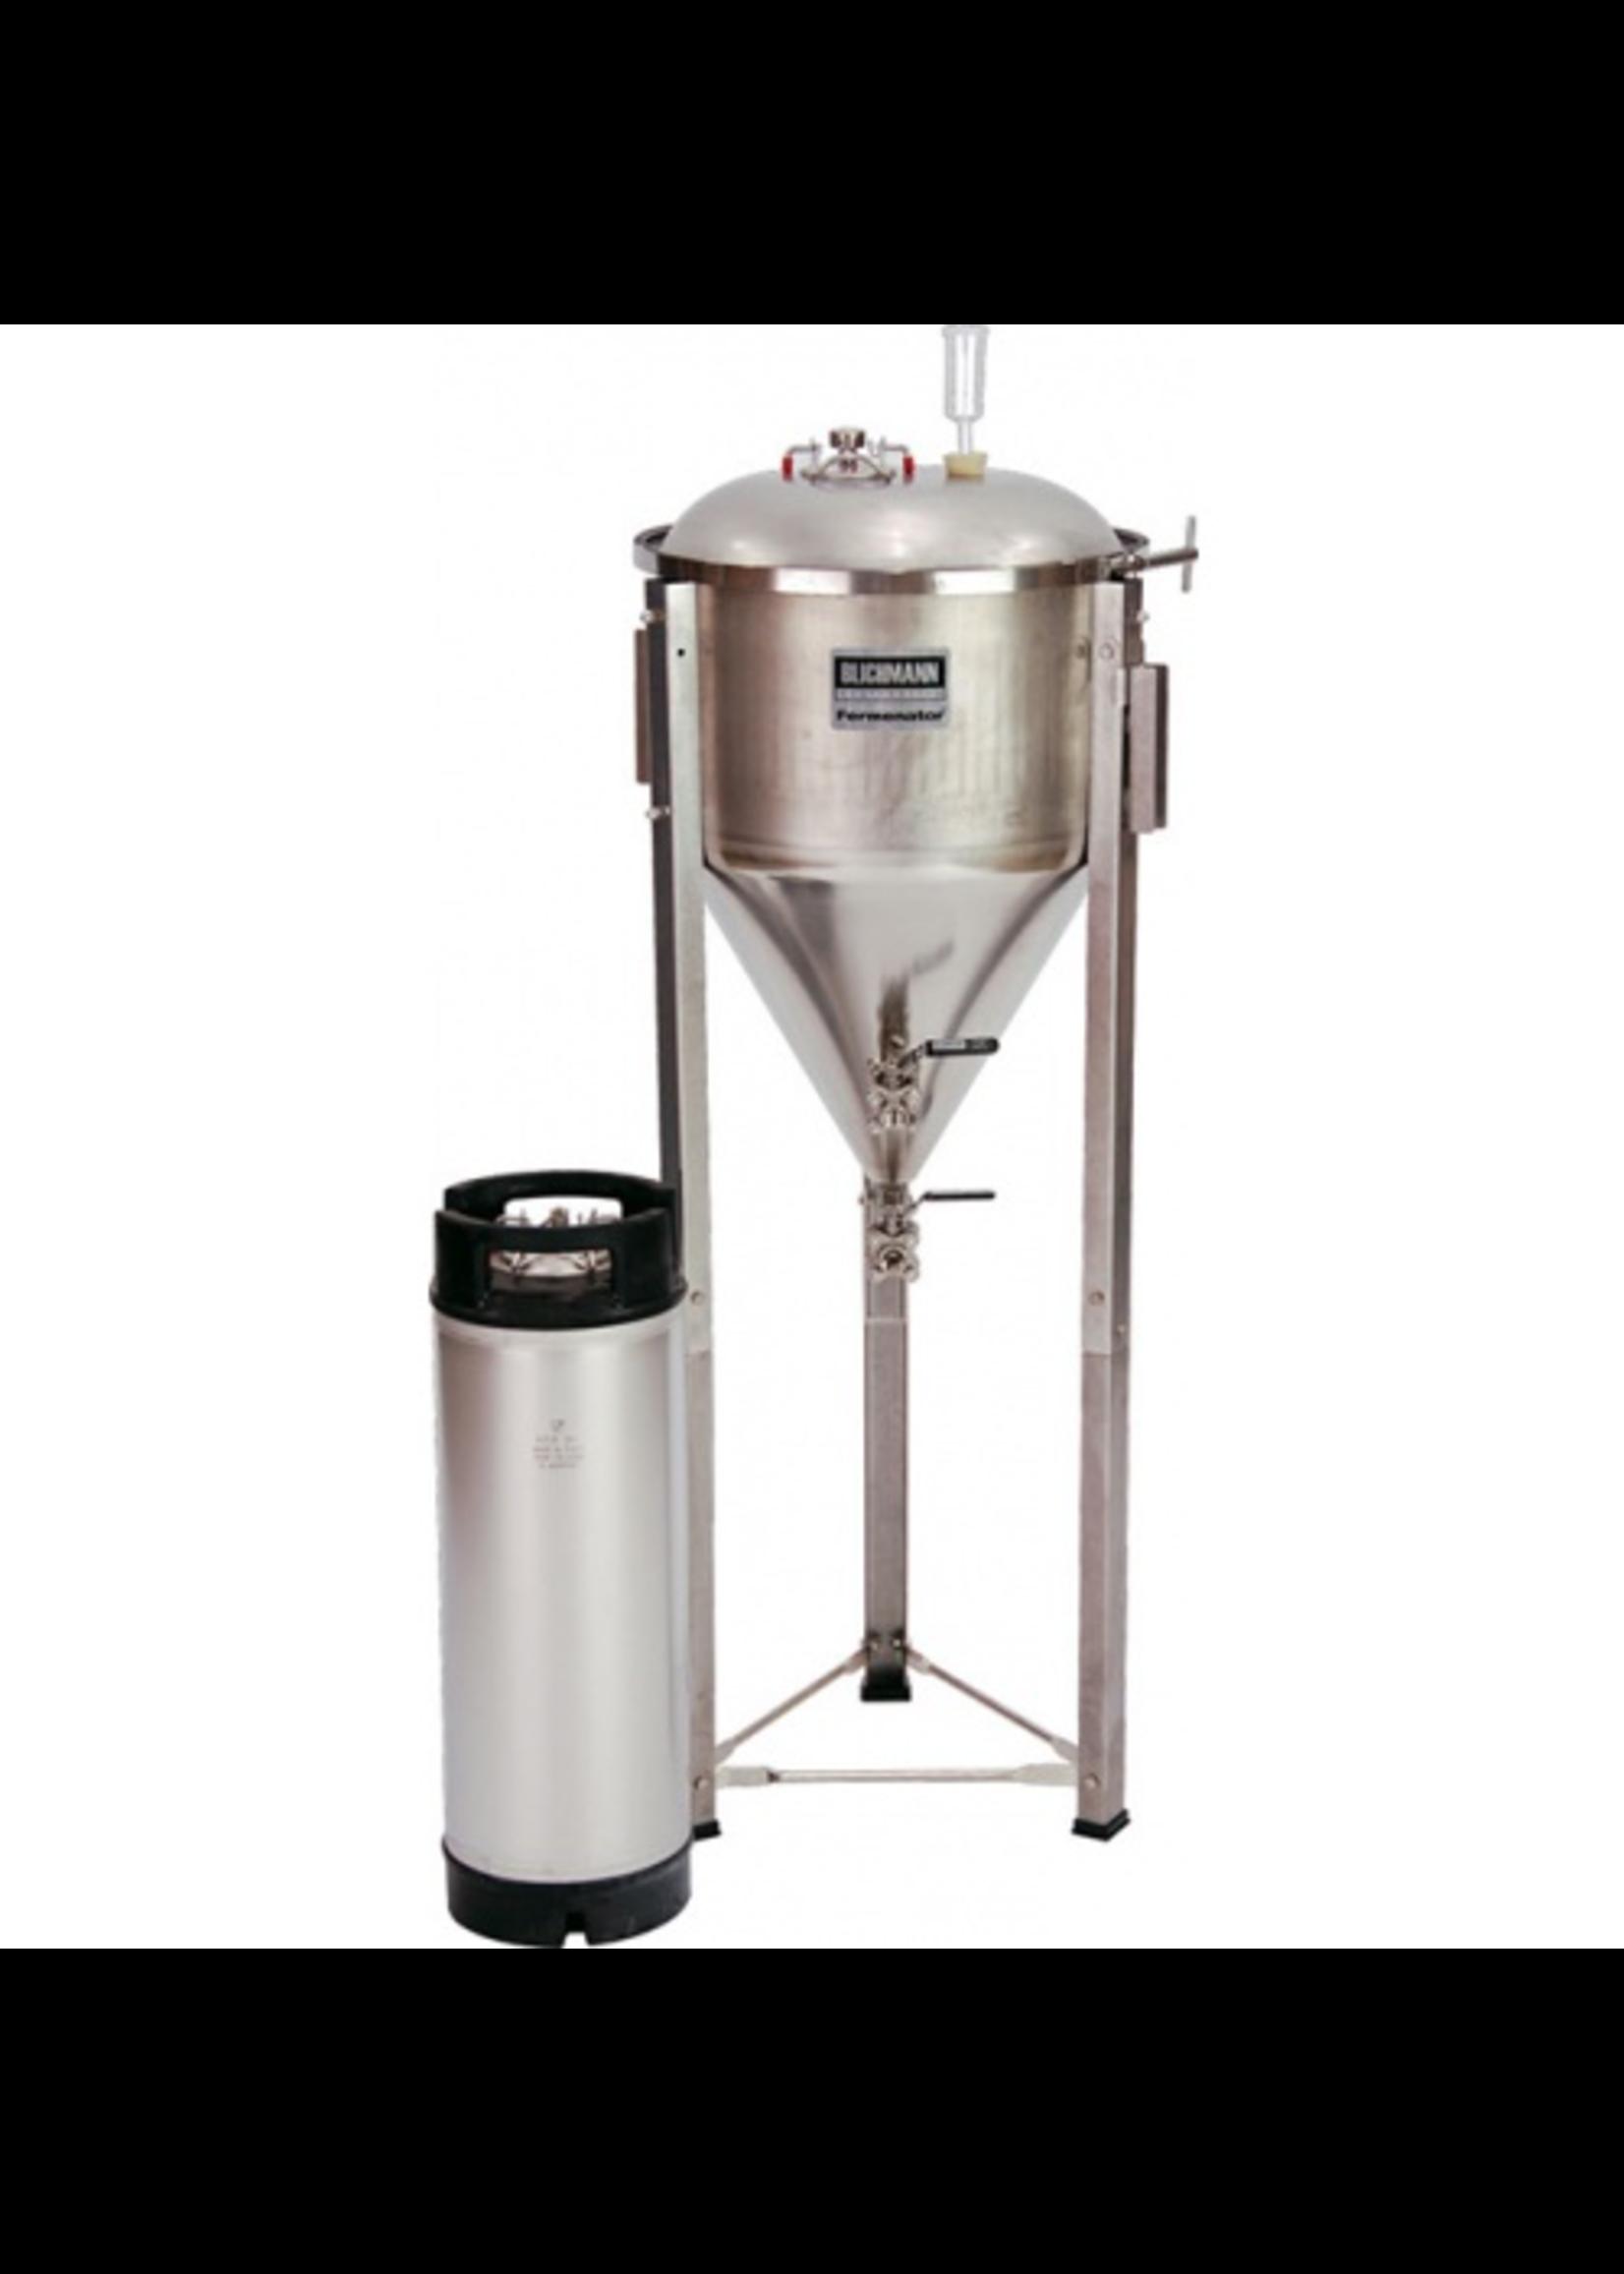 Blichmann Blichmann Fermenator - Leg Extensions for 42 Gallon Conical